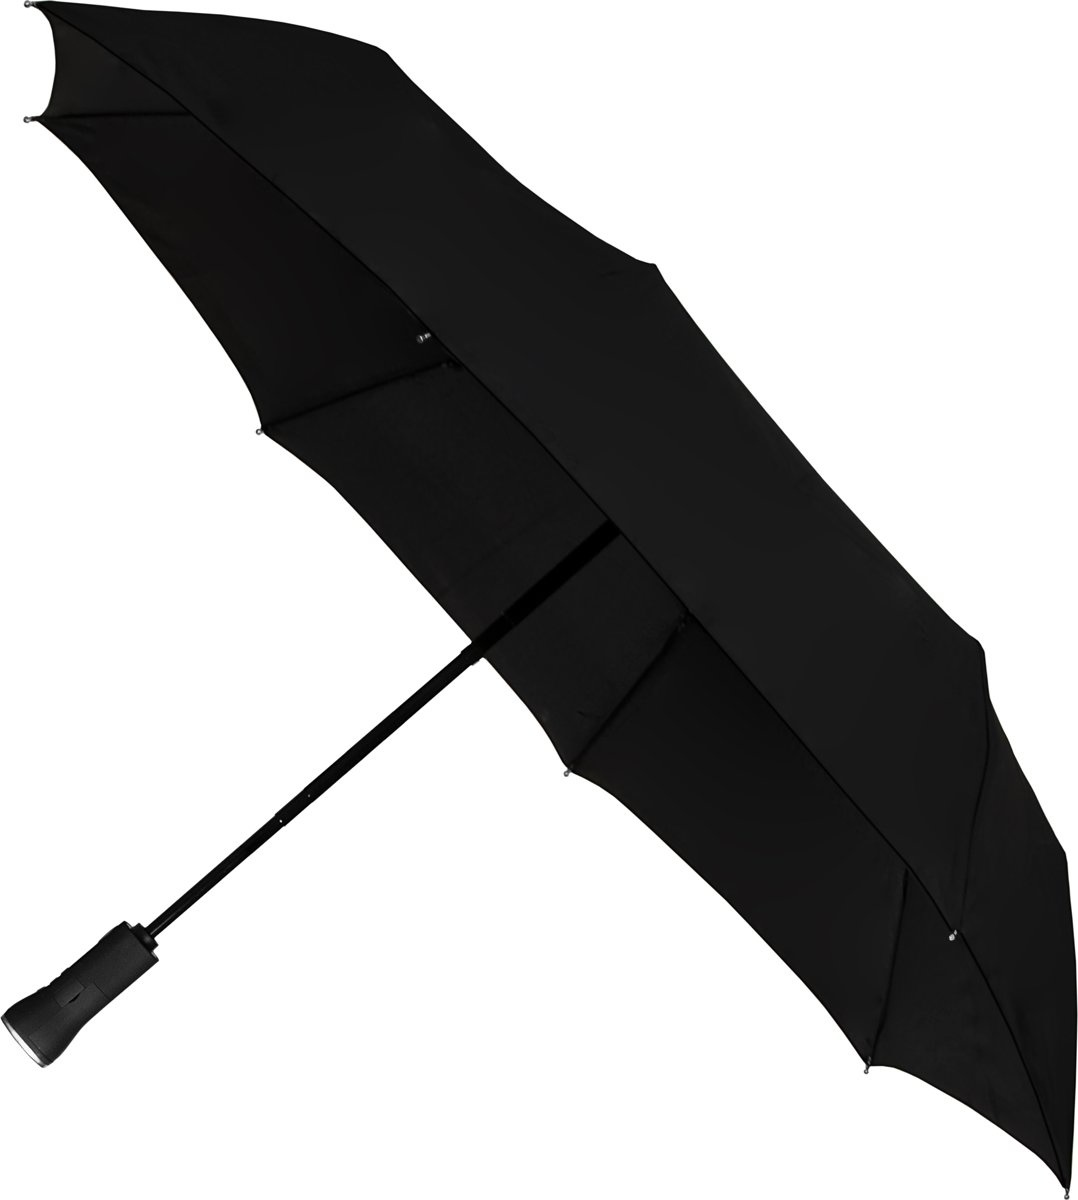 Impliva Impliva Windproof opvouwbare automatic Paraplu  met bluetooth speaker